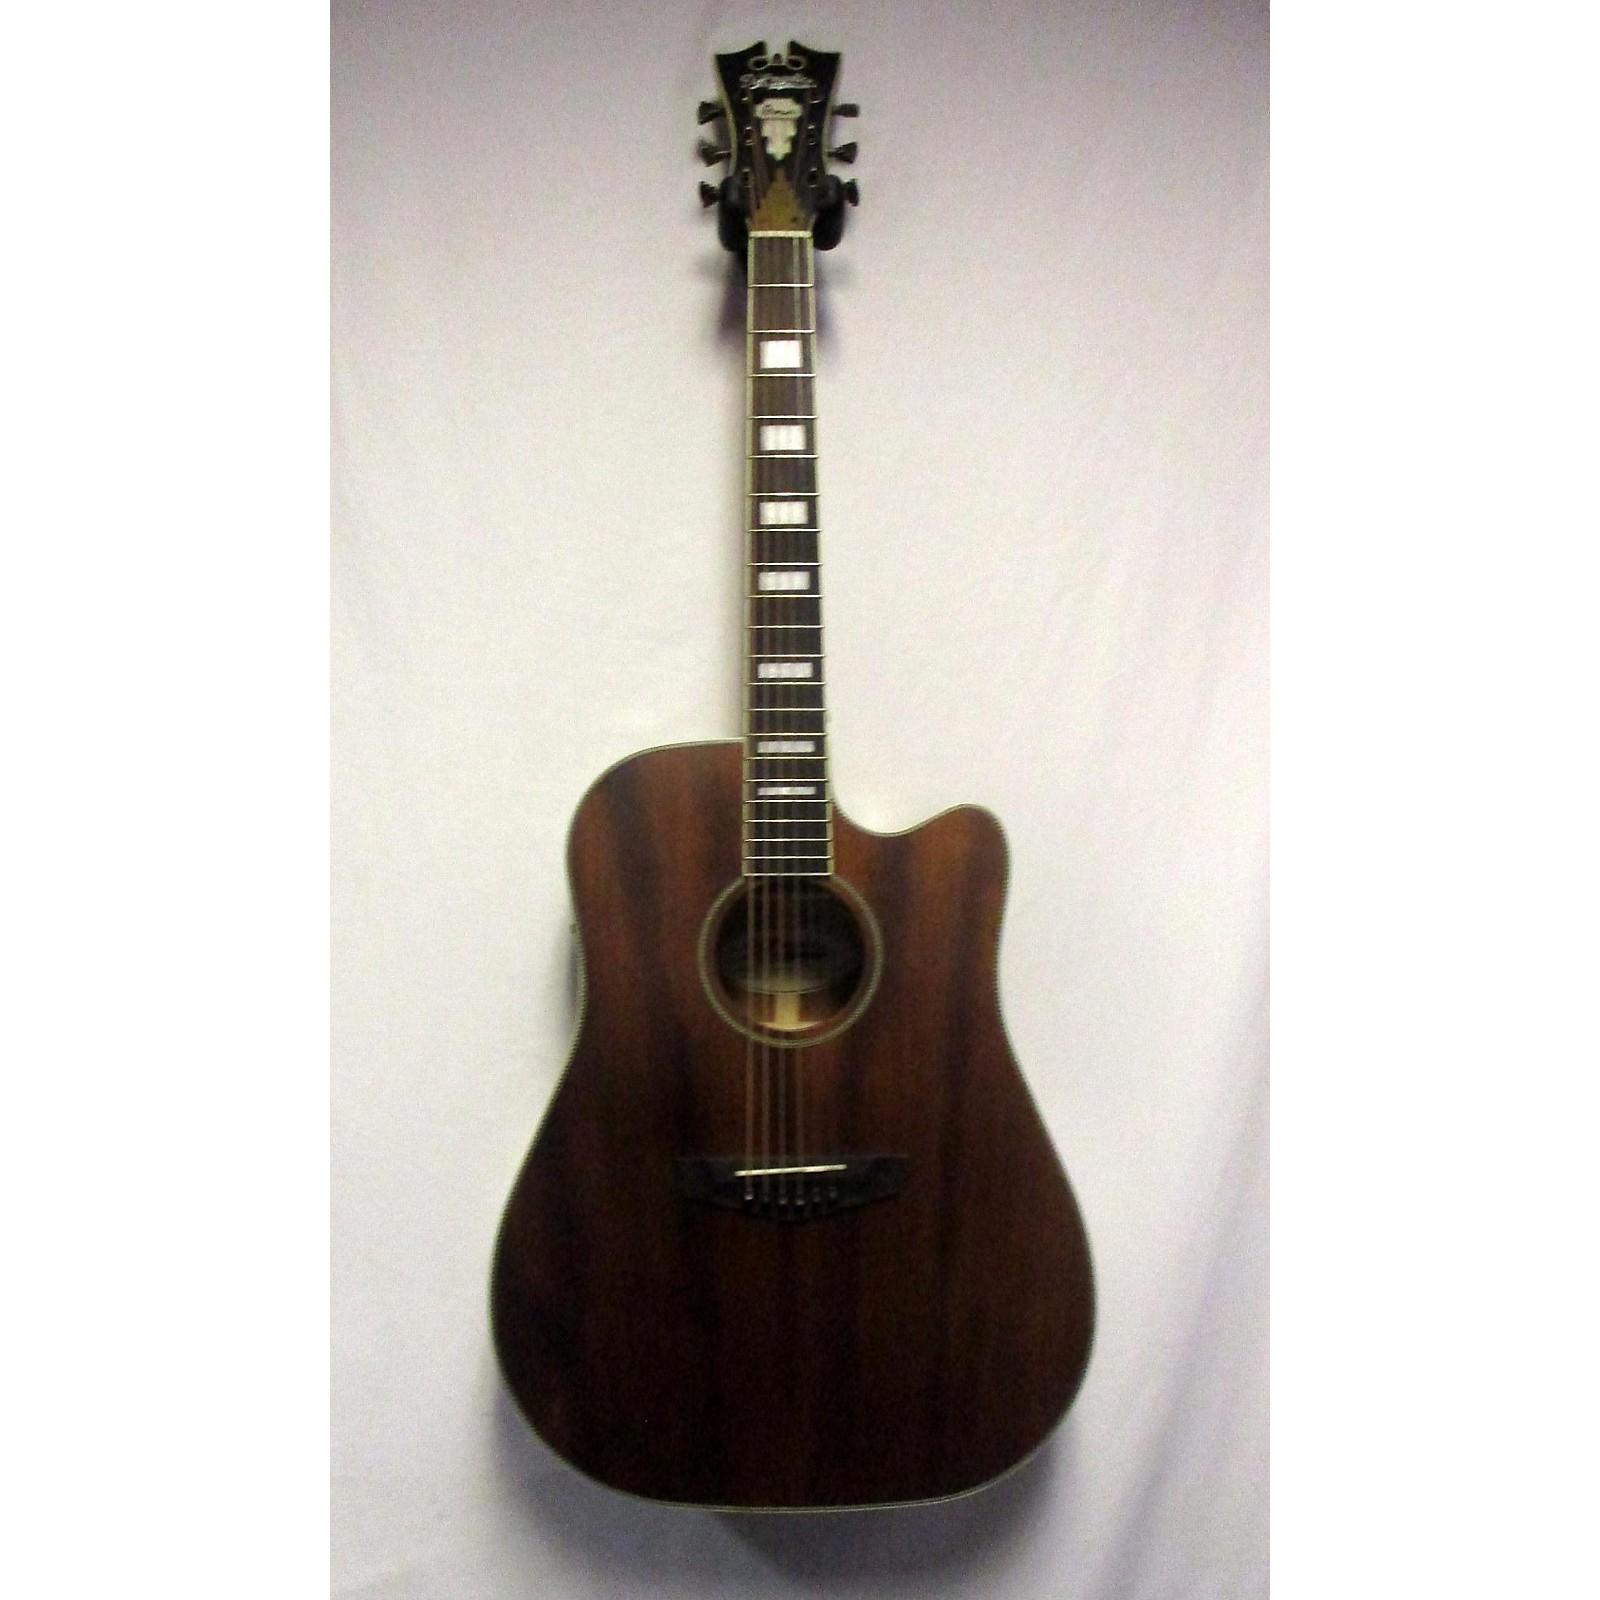 D'Angelico Dapg20mns Acoustic Guitar